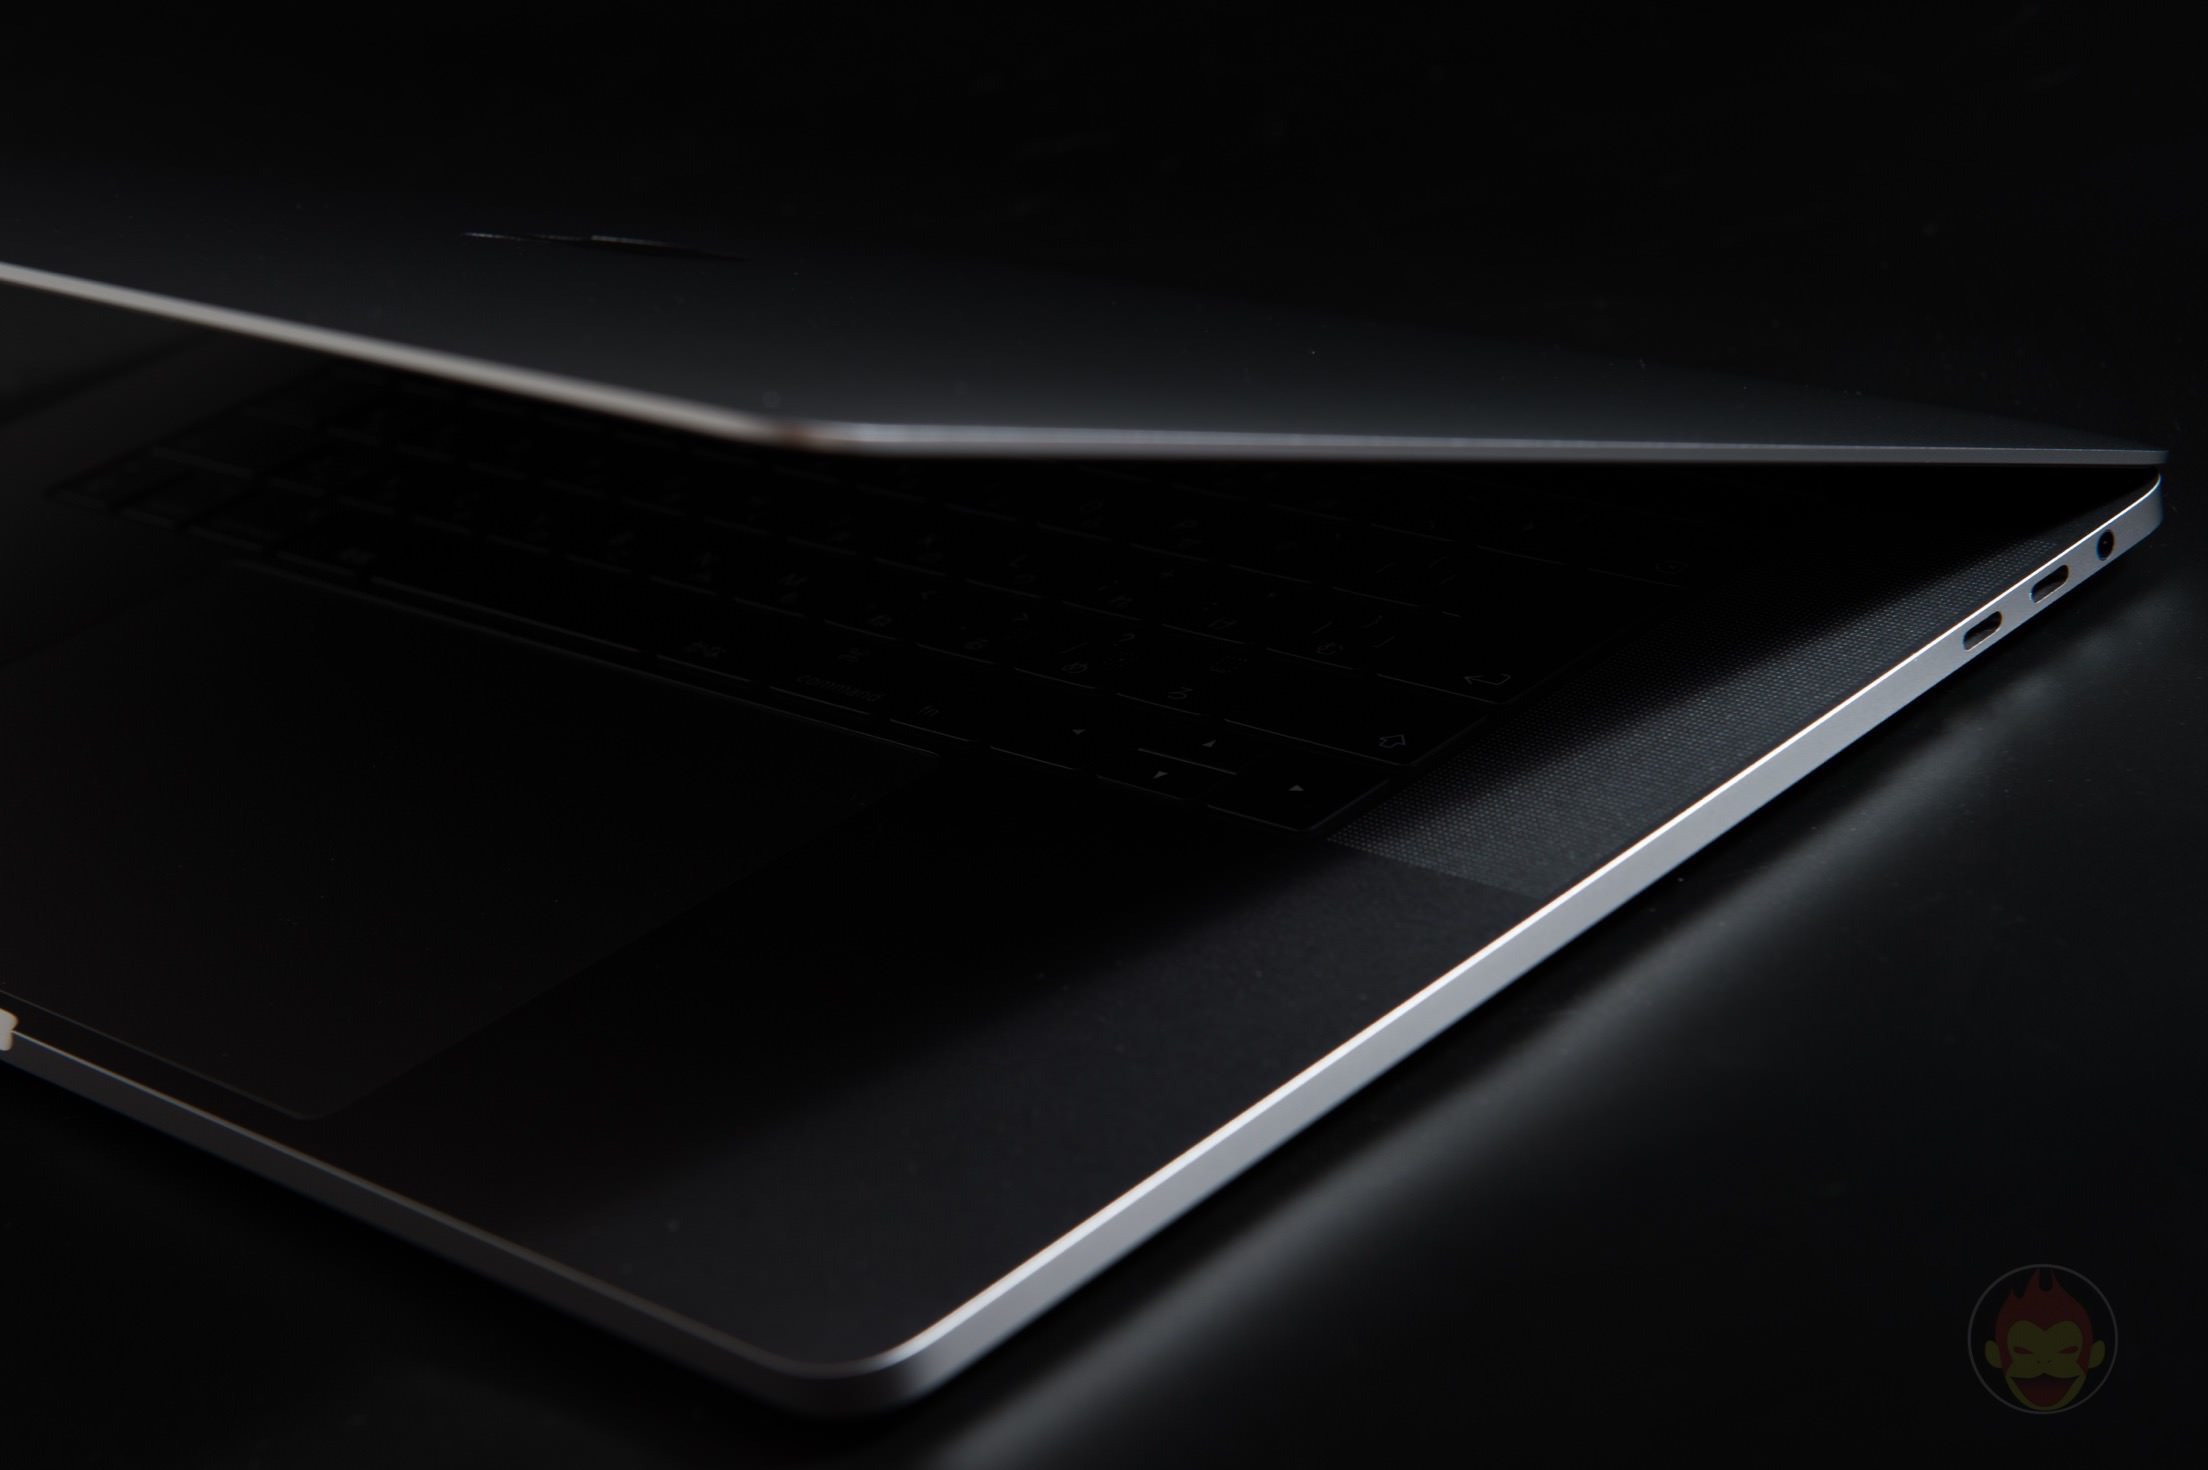 MacBook-Pro-15inch-2017-Yamasha-03.jpg